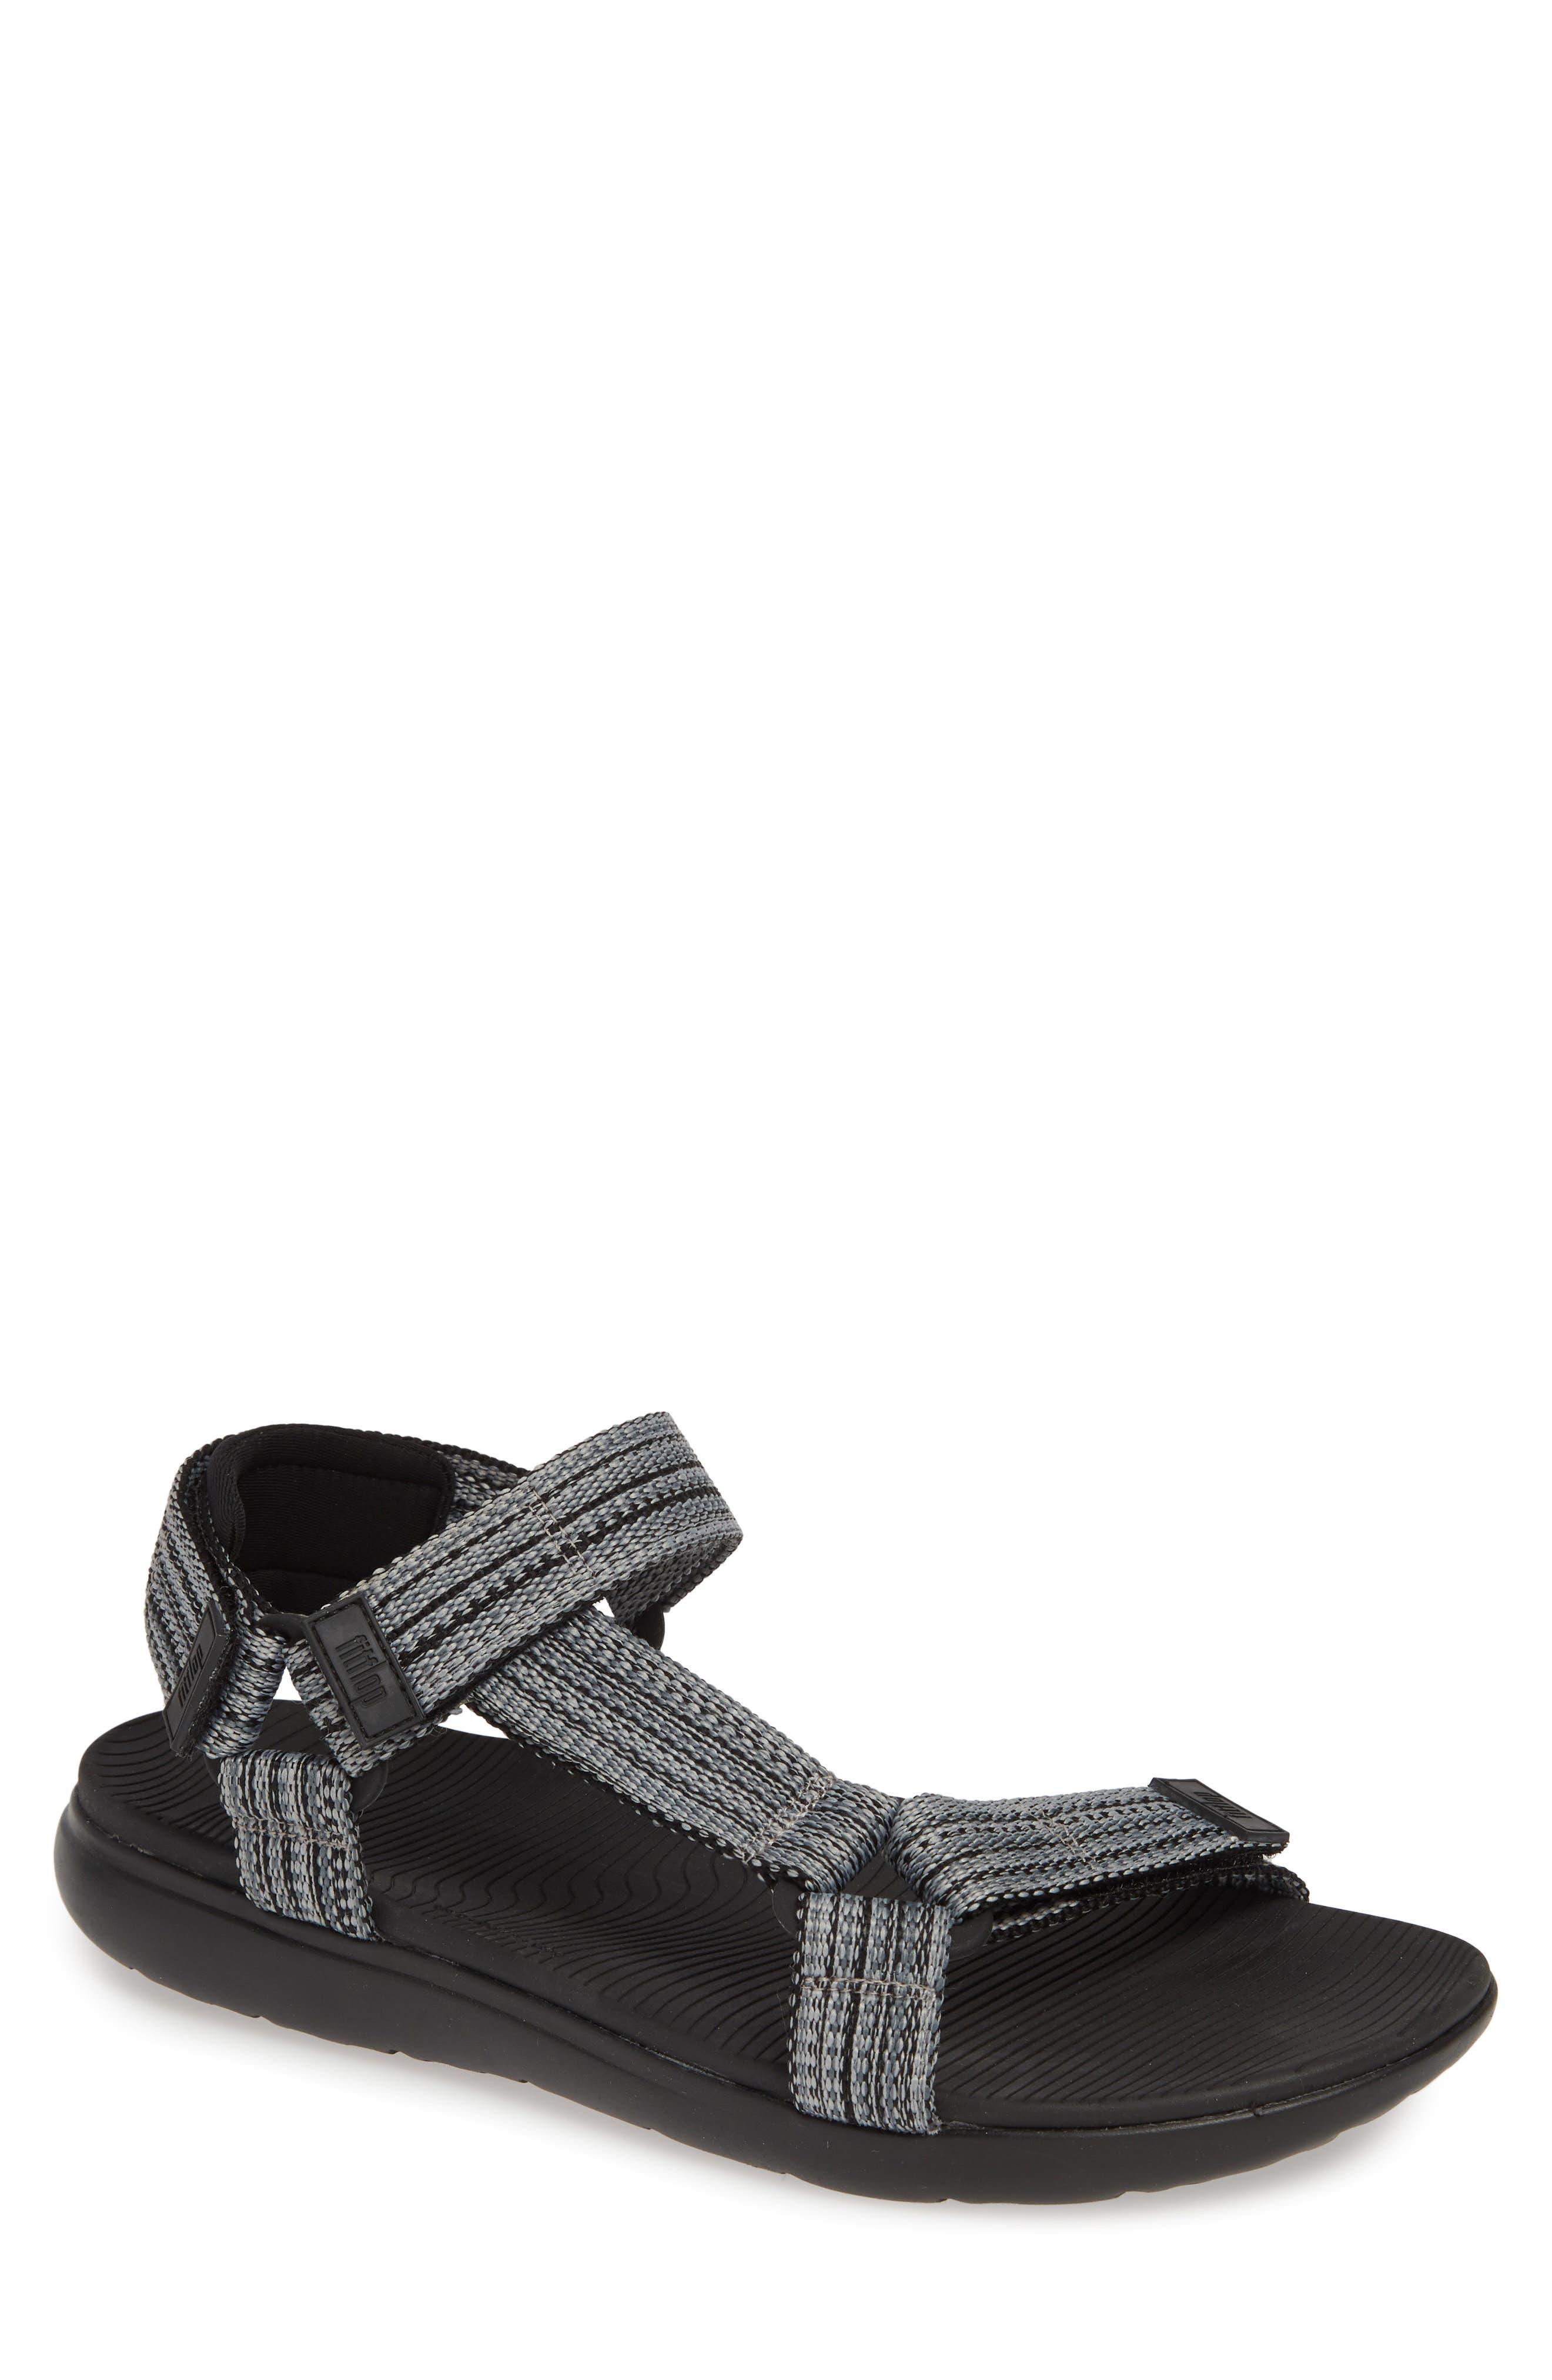 Freshweave Sport Sandal, Main, color, BLACK KNIT